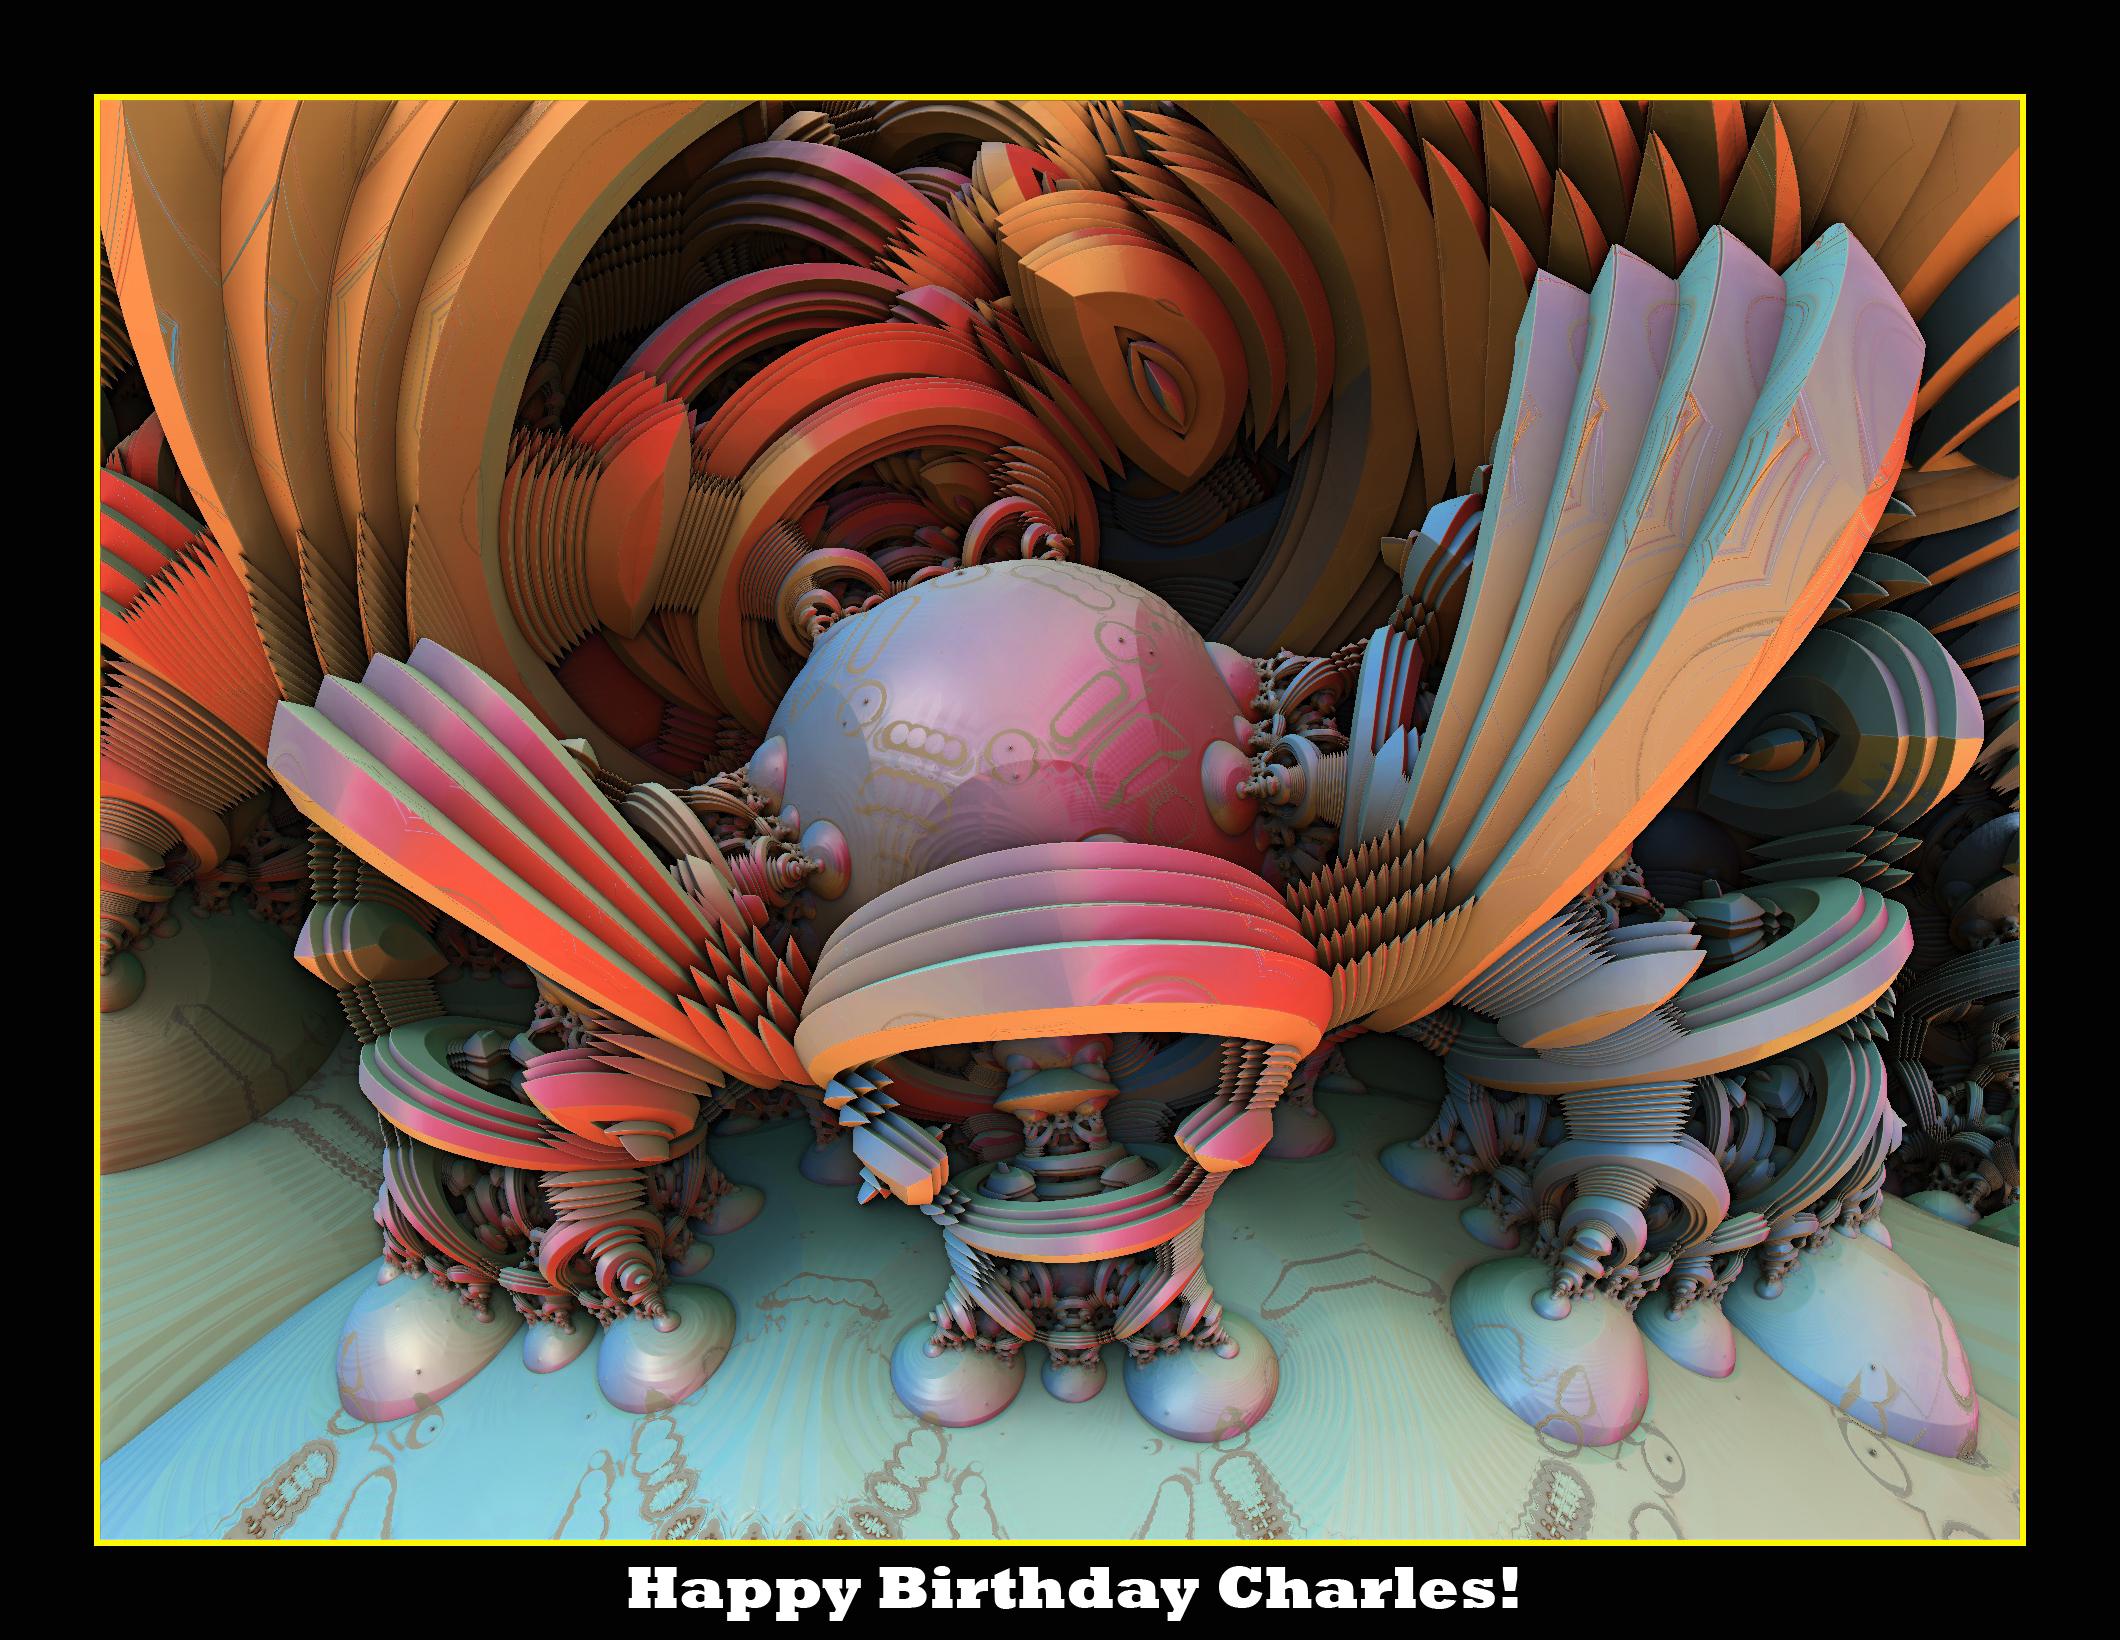 Happy Birthday Charles! by LightBulbMoon